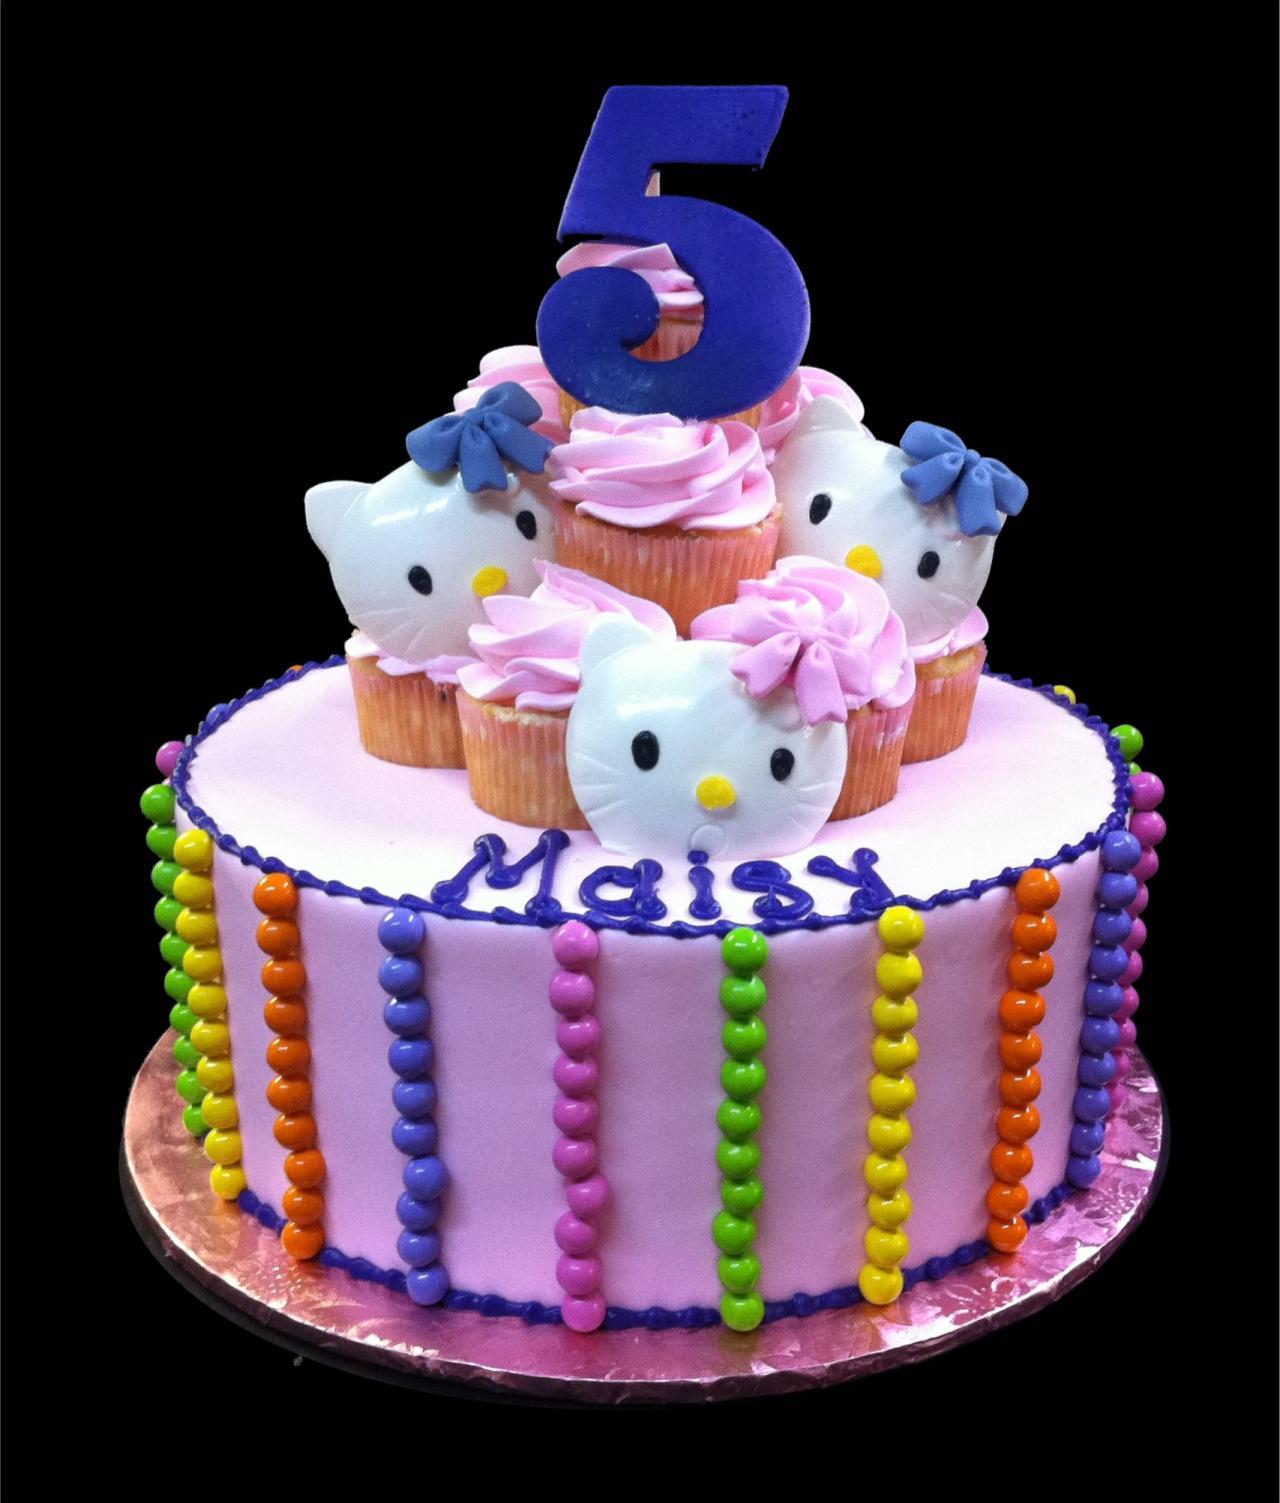 Brilliant 11 Diamond Girl 5Th Birthday Cakes Photo Girls Birthday Cake Funny Birthday Cards Online Bapapcheapnameinfo